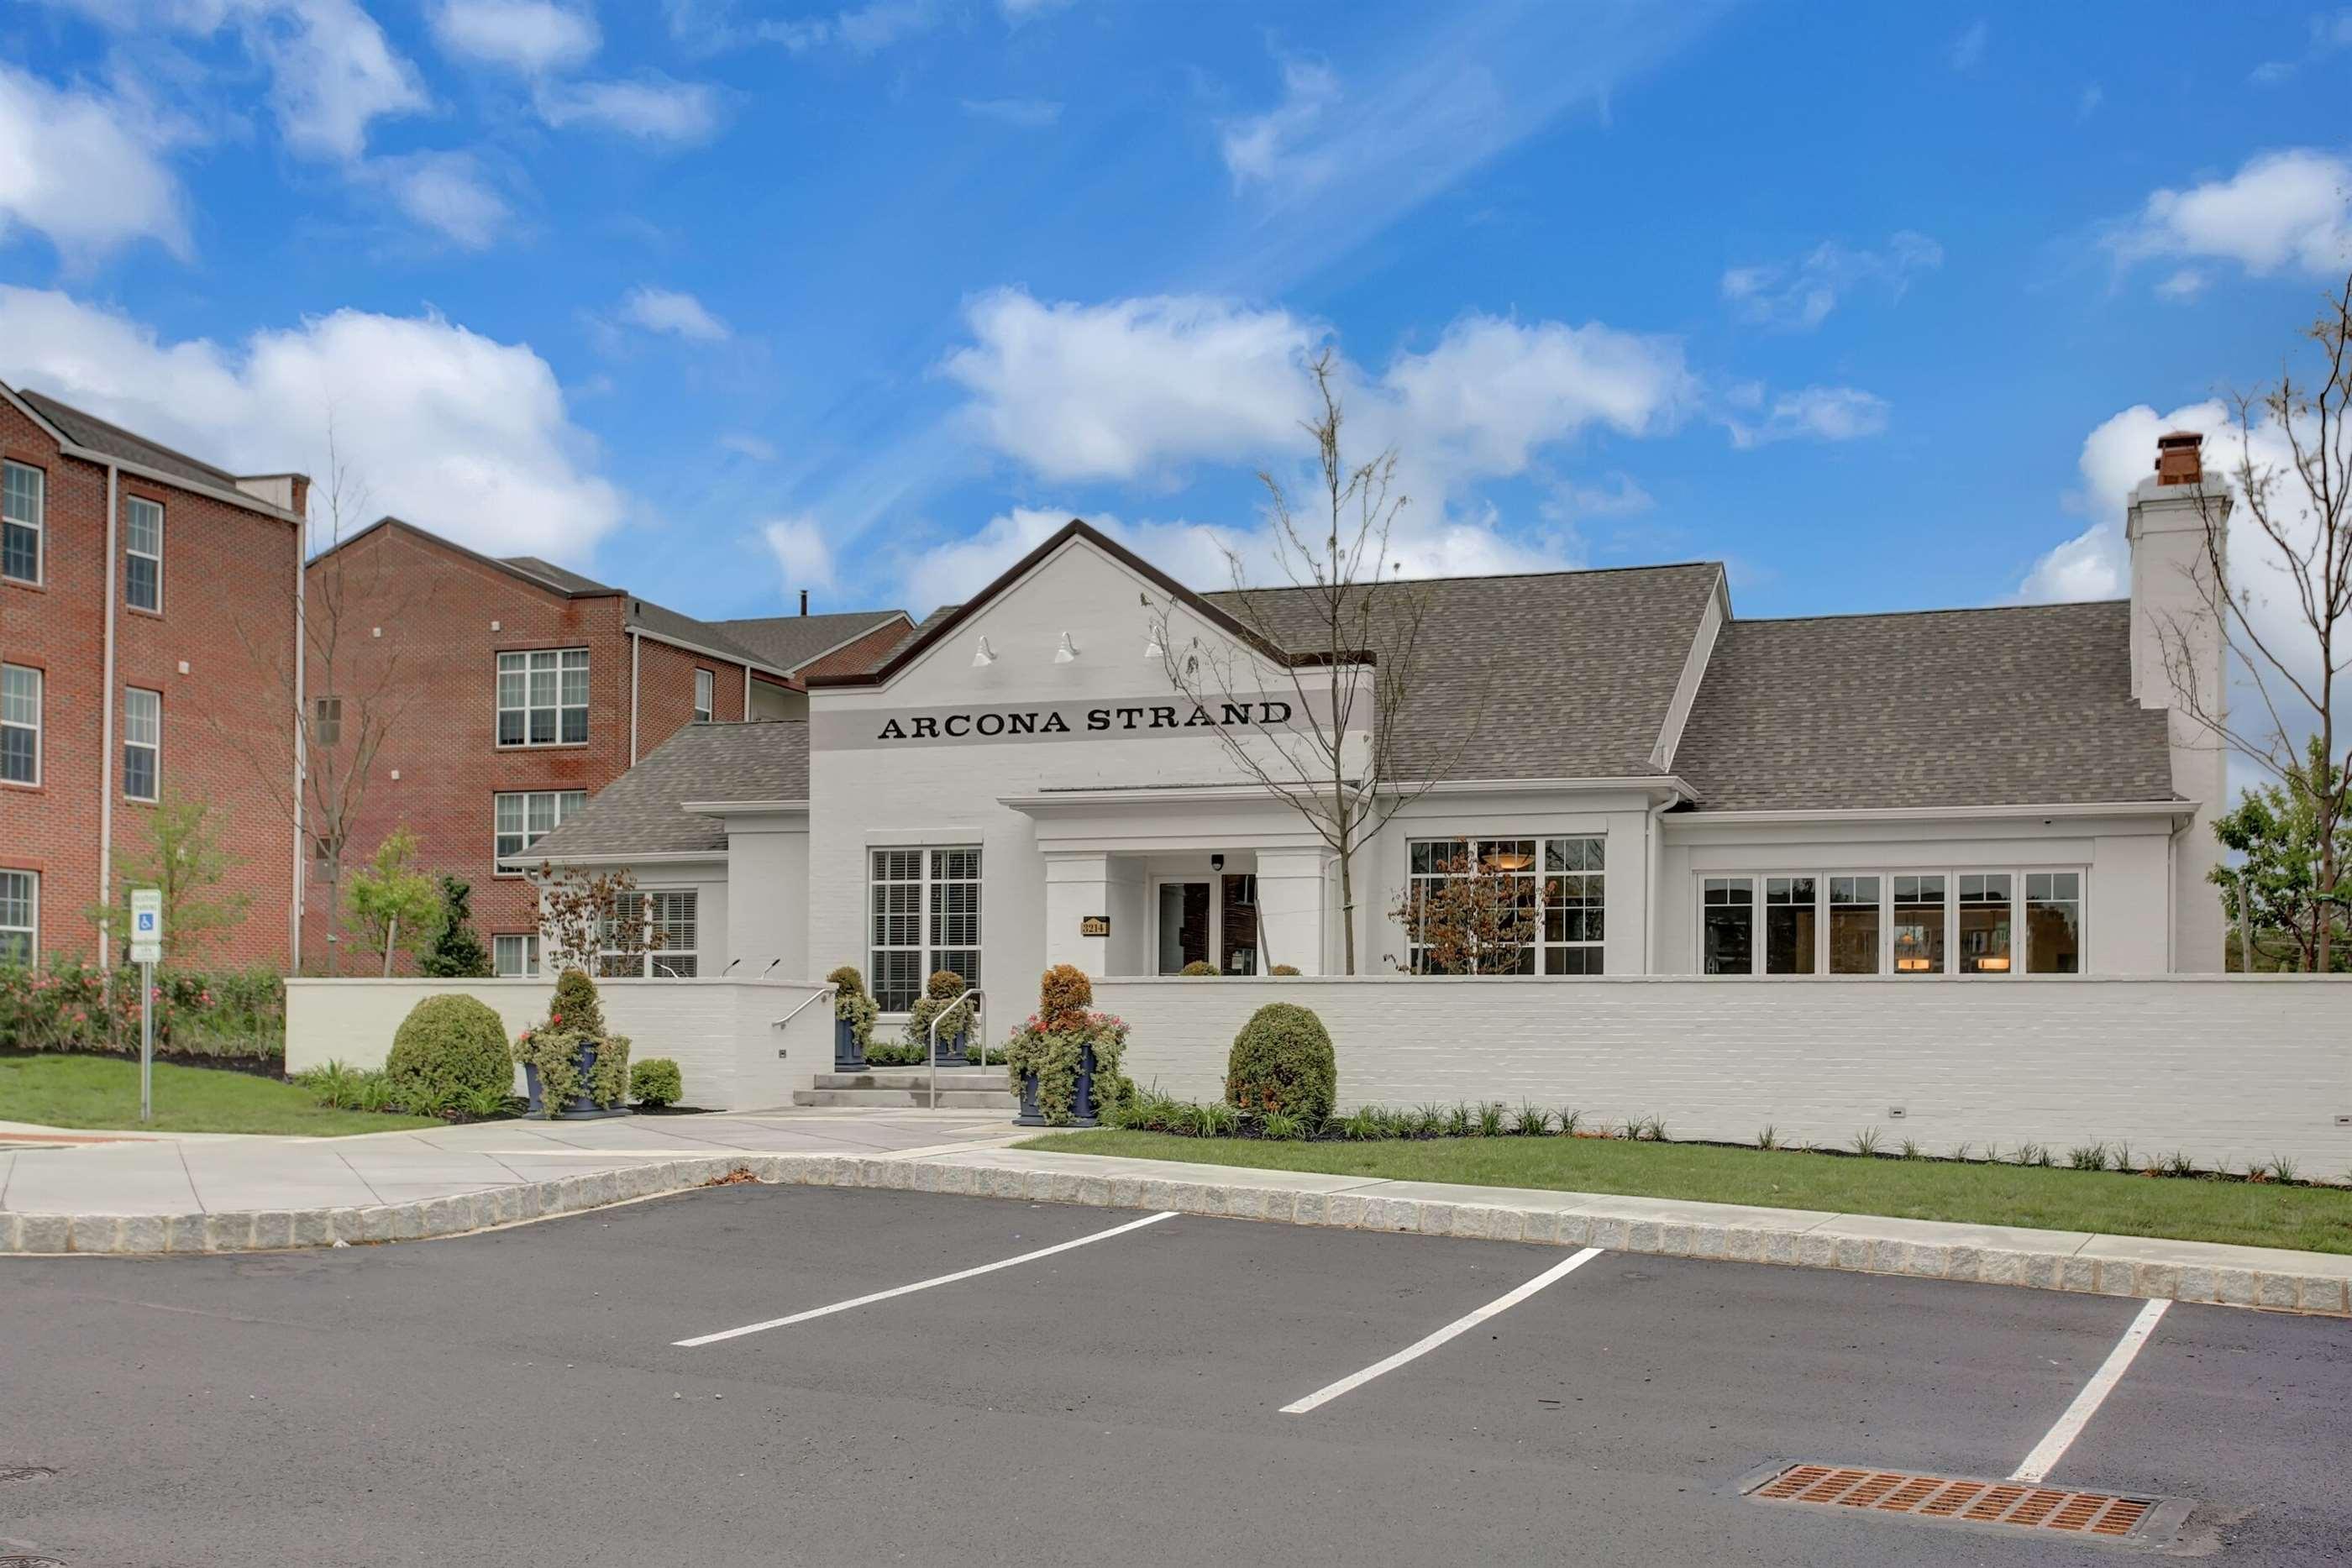 3262 Lark Way, Mechanicsburg, PA 17055